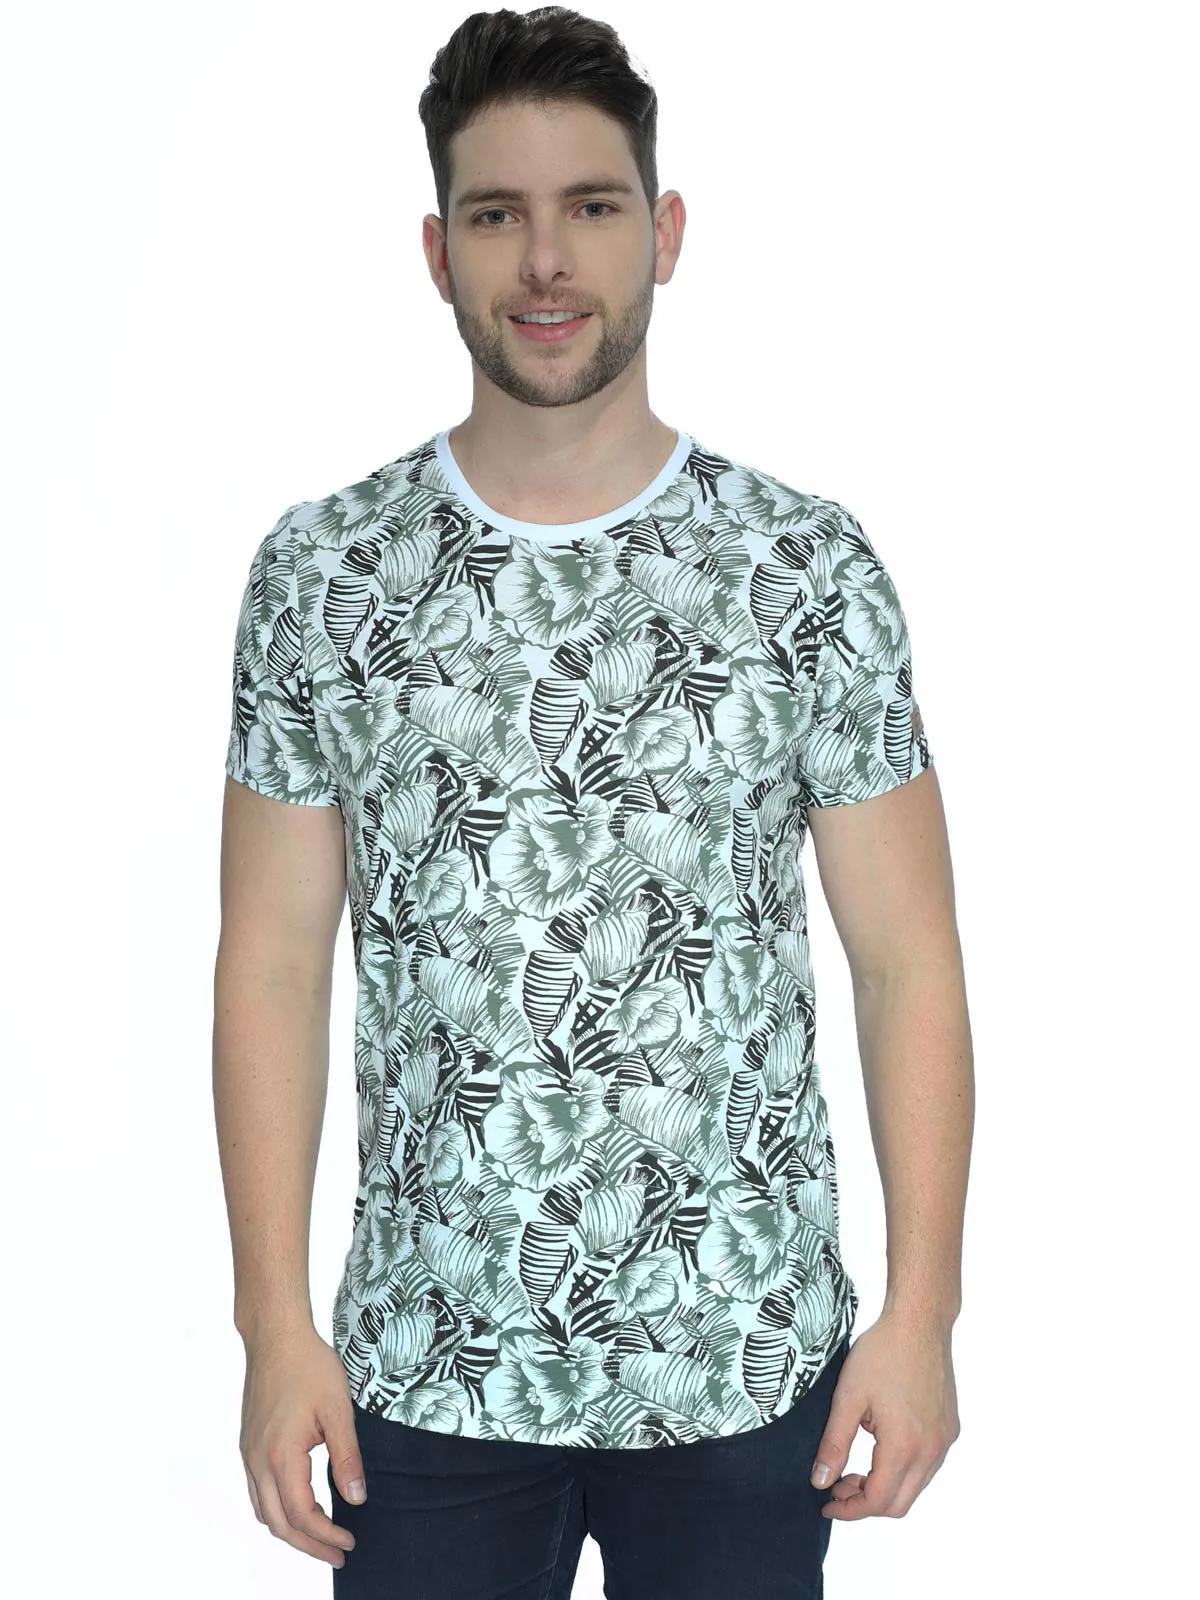 Camiseta Masculina Swag Longline Estampada Manga Curta Branca